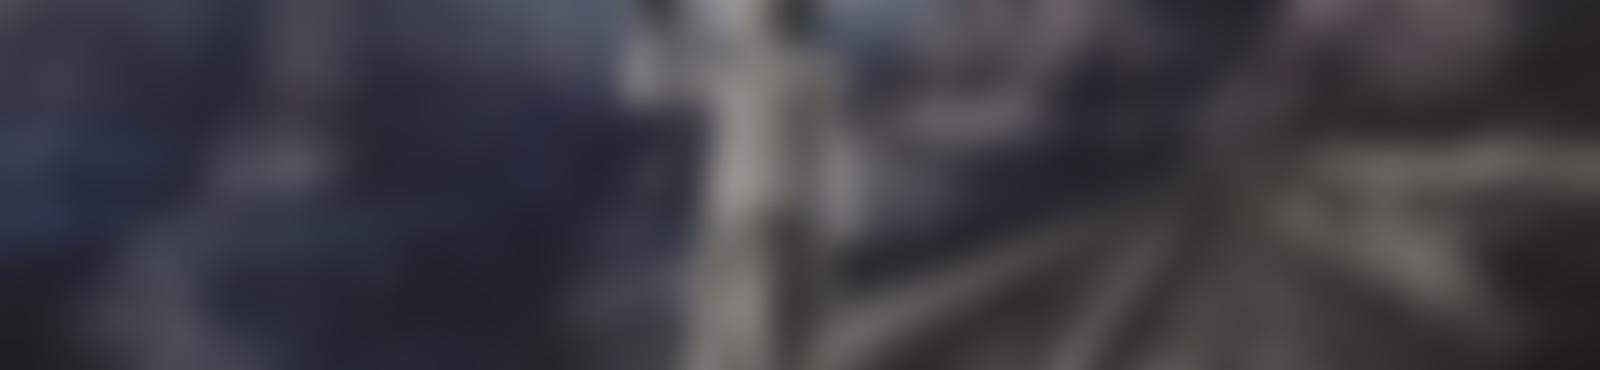 Blurred e7763876 82b4 4cc5 afb3 9fa6edd7064c